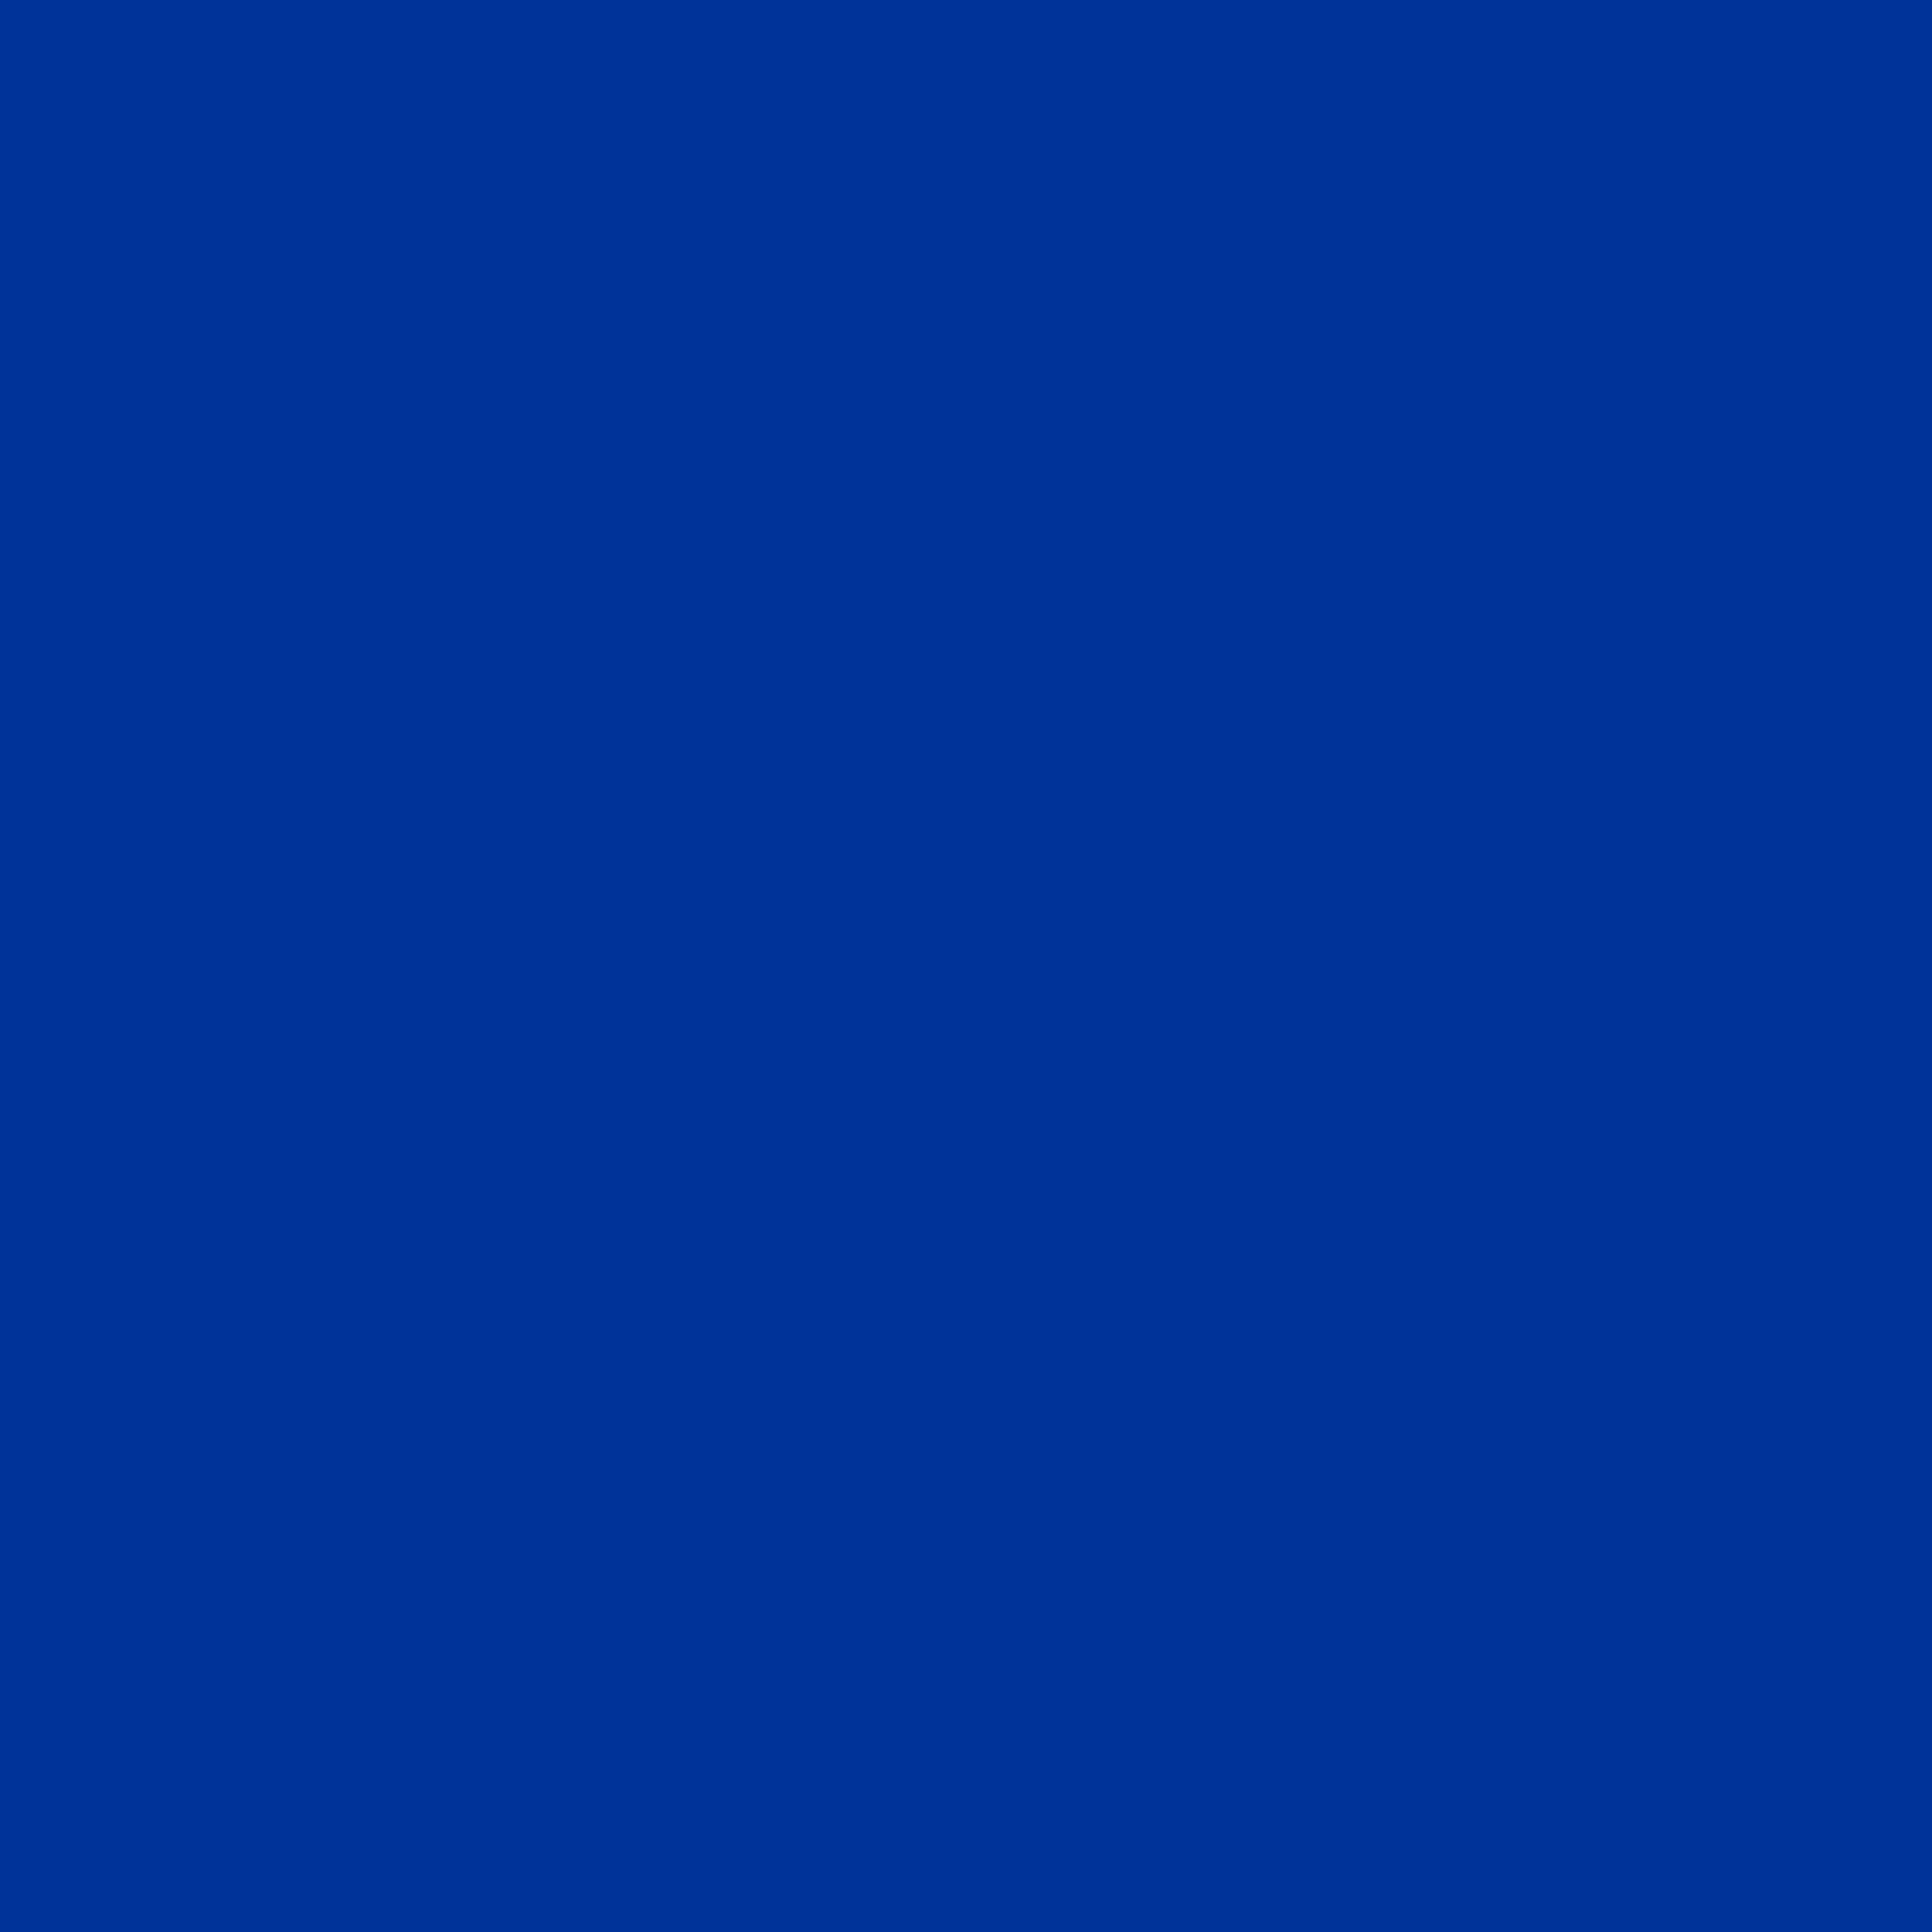 2048x2048 Smalt Dark Powder Blue Solid Color Background